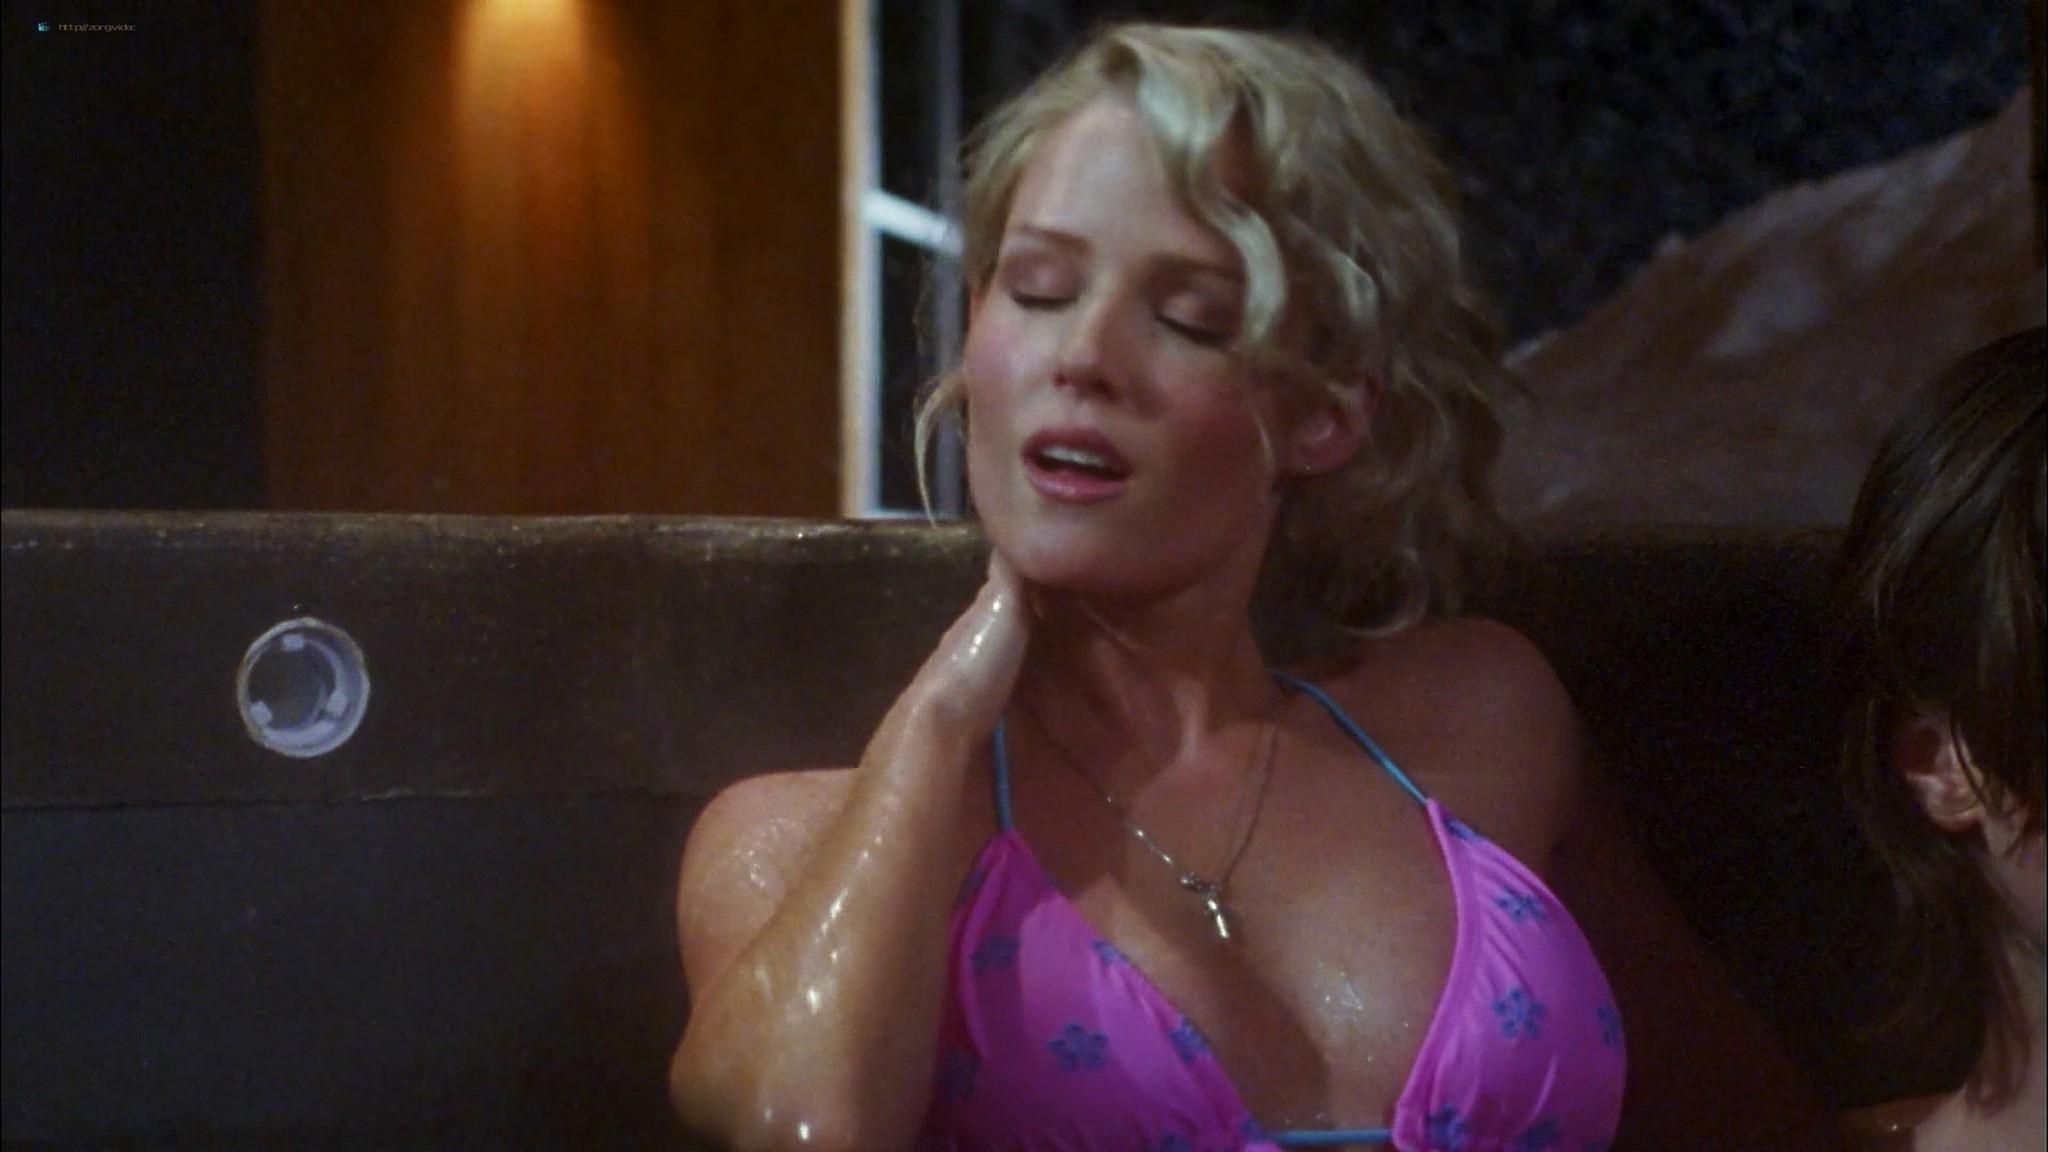 Lindsay Maxwell nude Amber Borycki sexy - Revenge of the Boarding School Dropouts (2009) HD 1080p Web (14)